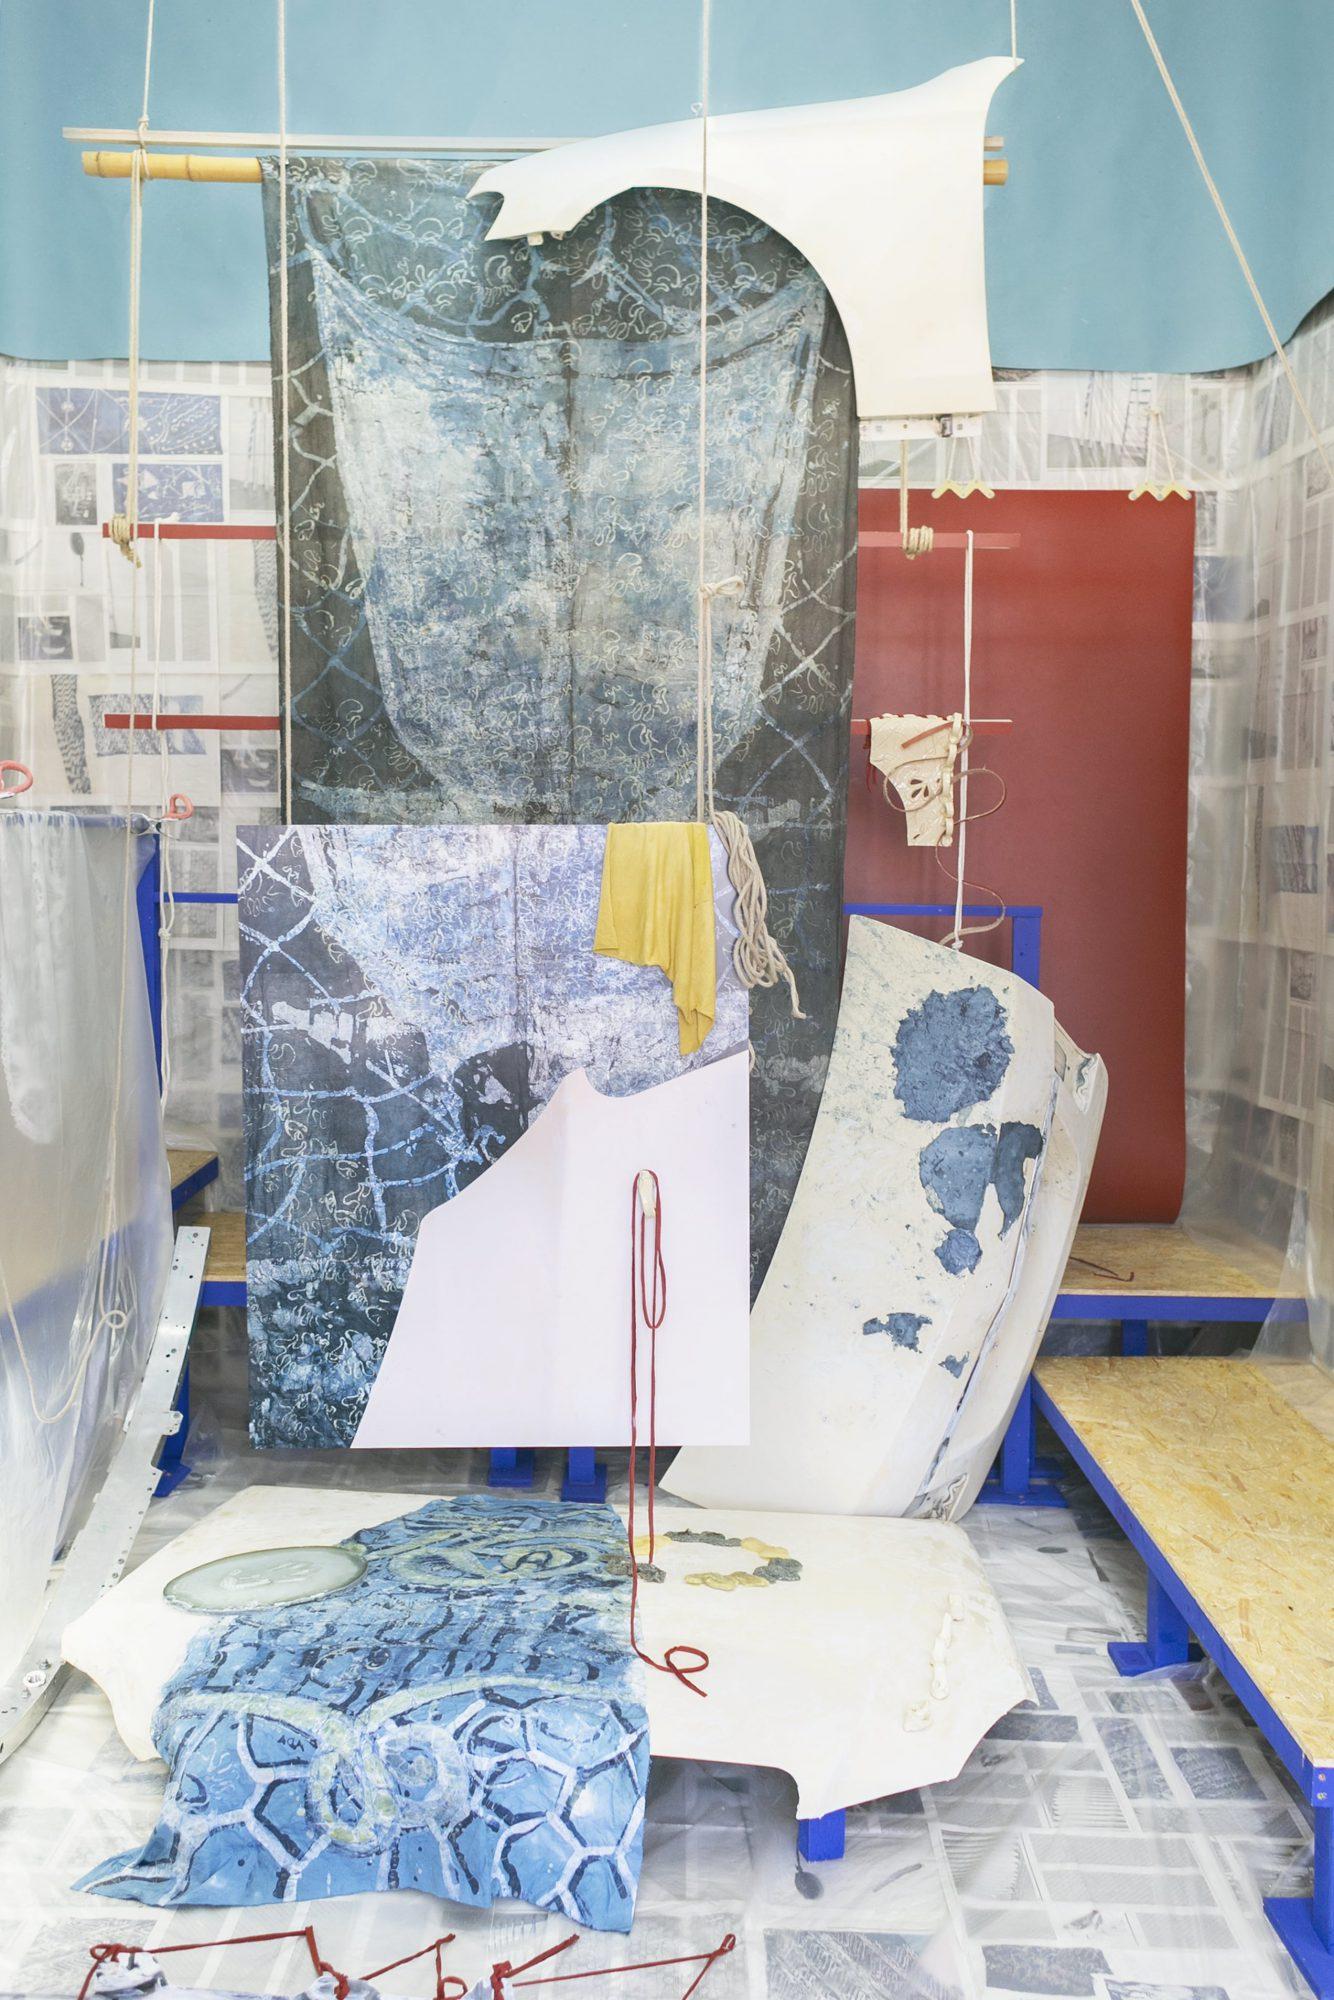 <p>Ada Van Hoorenbeke, Goods & Services, 2019, installation view, photo: Anastasia Muna</p>